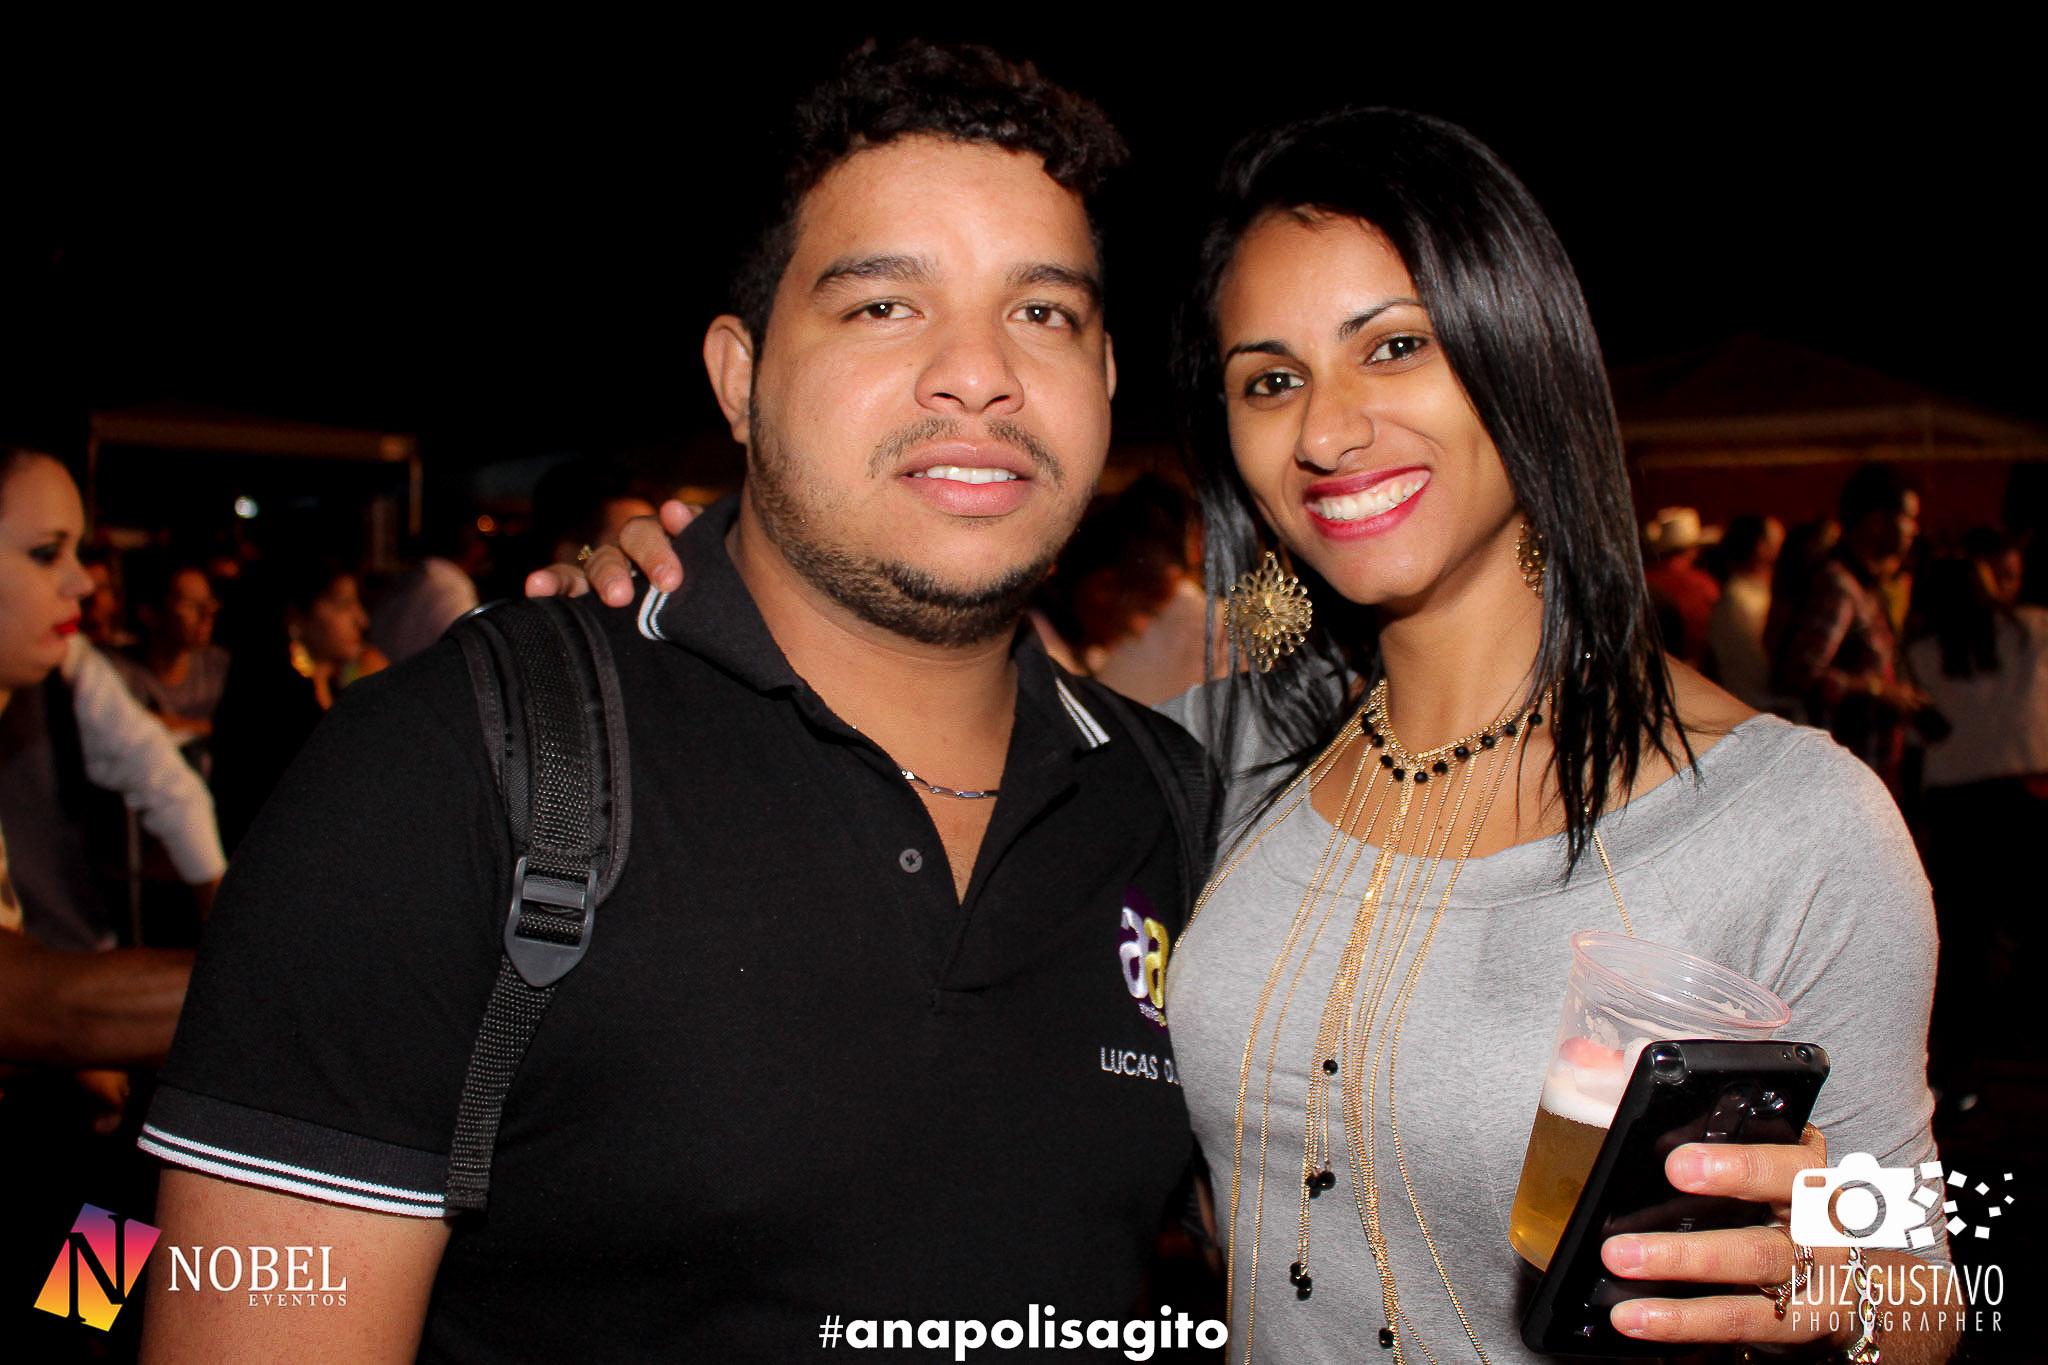 Luiz Gustavo Photographer-153